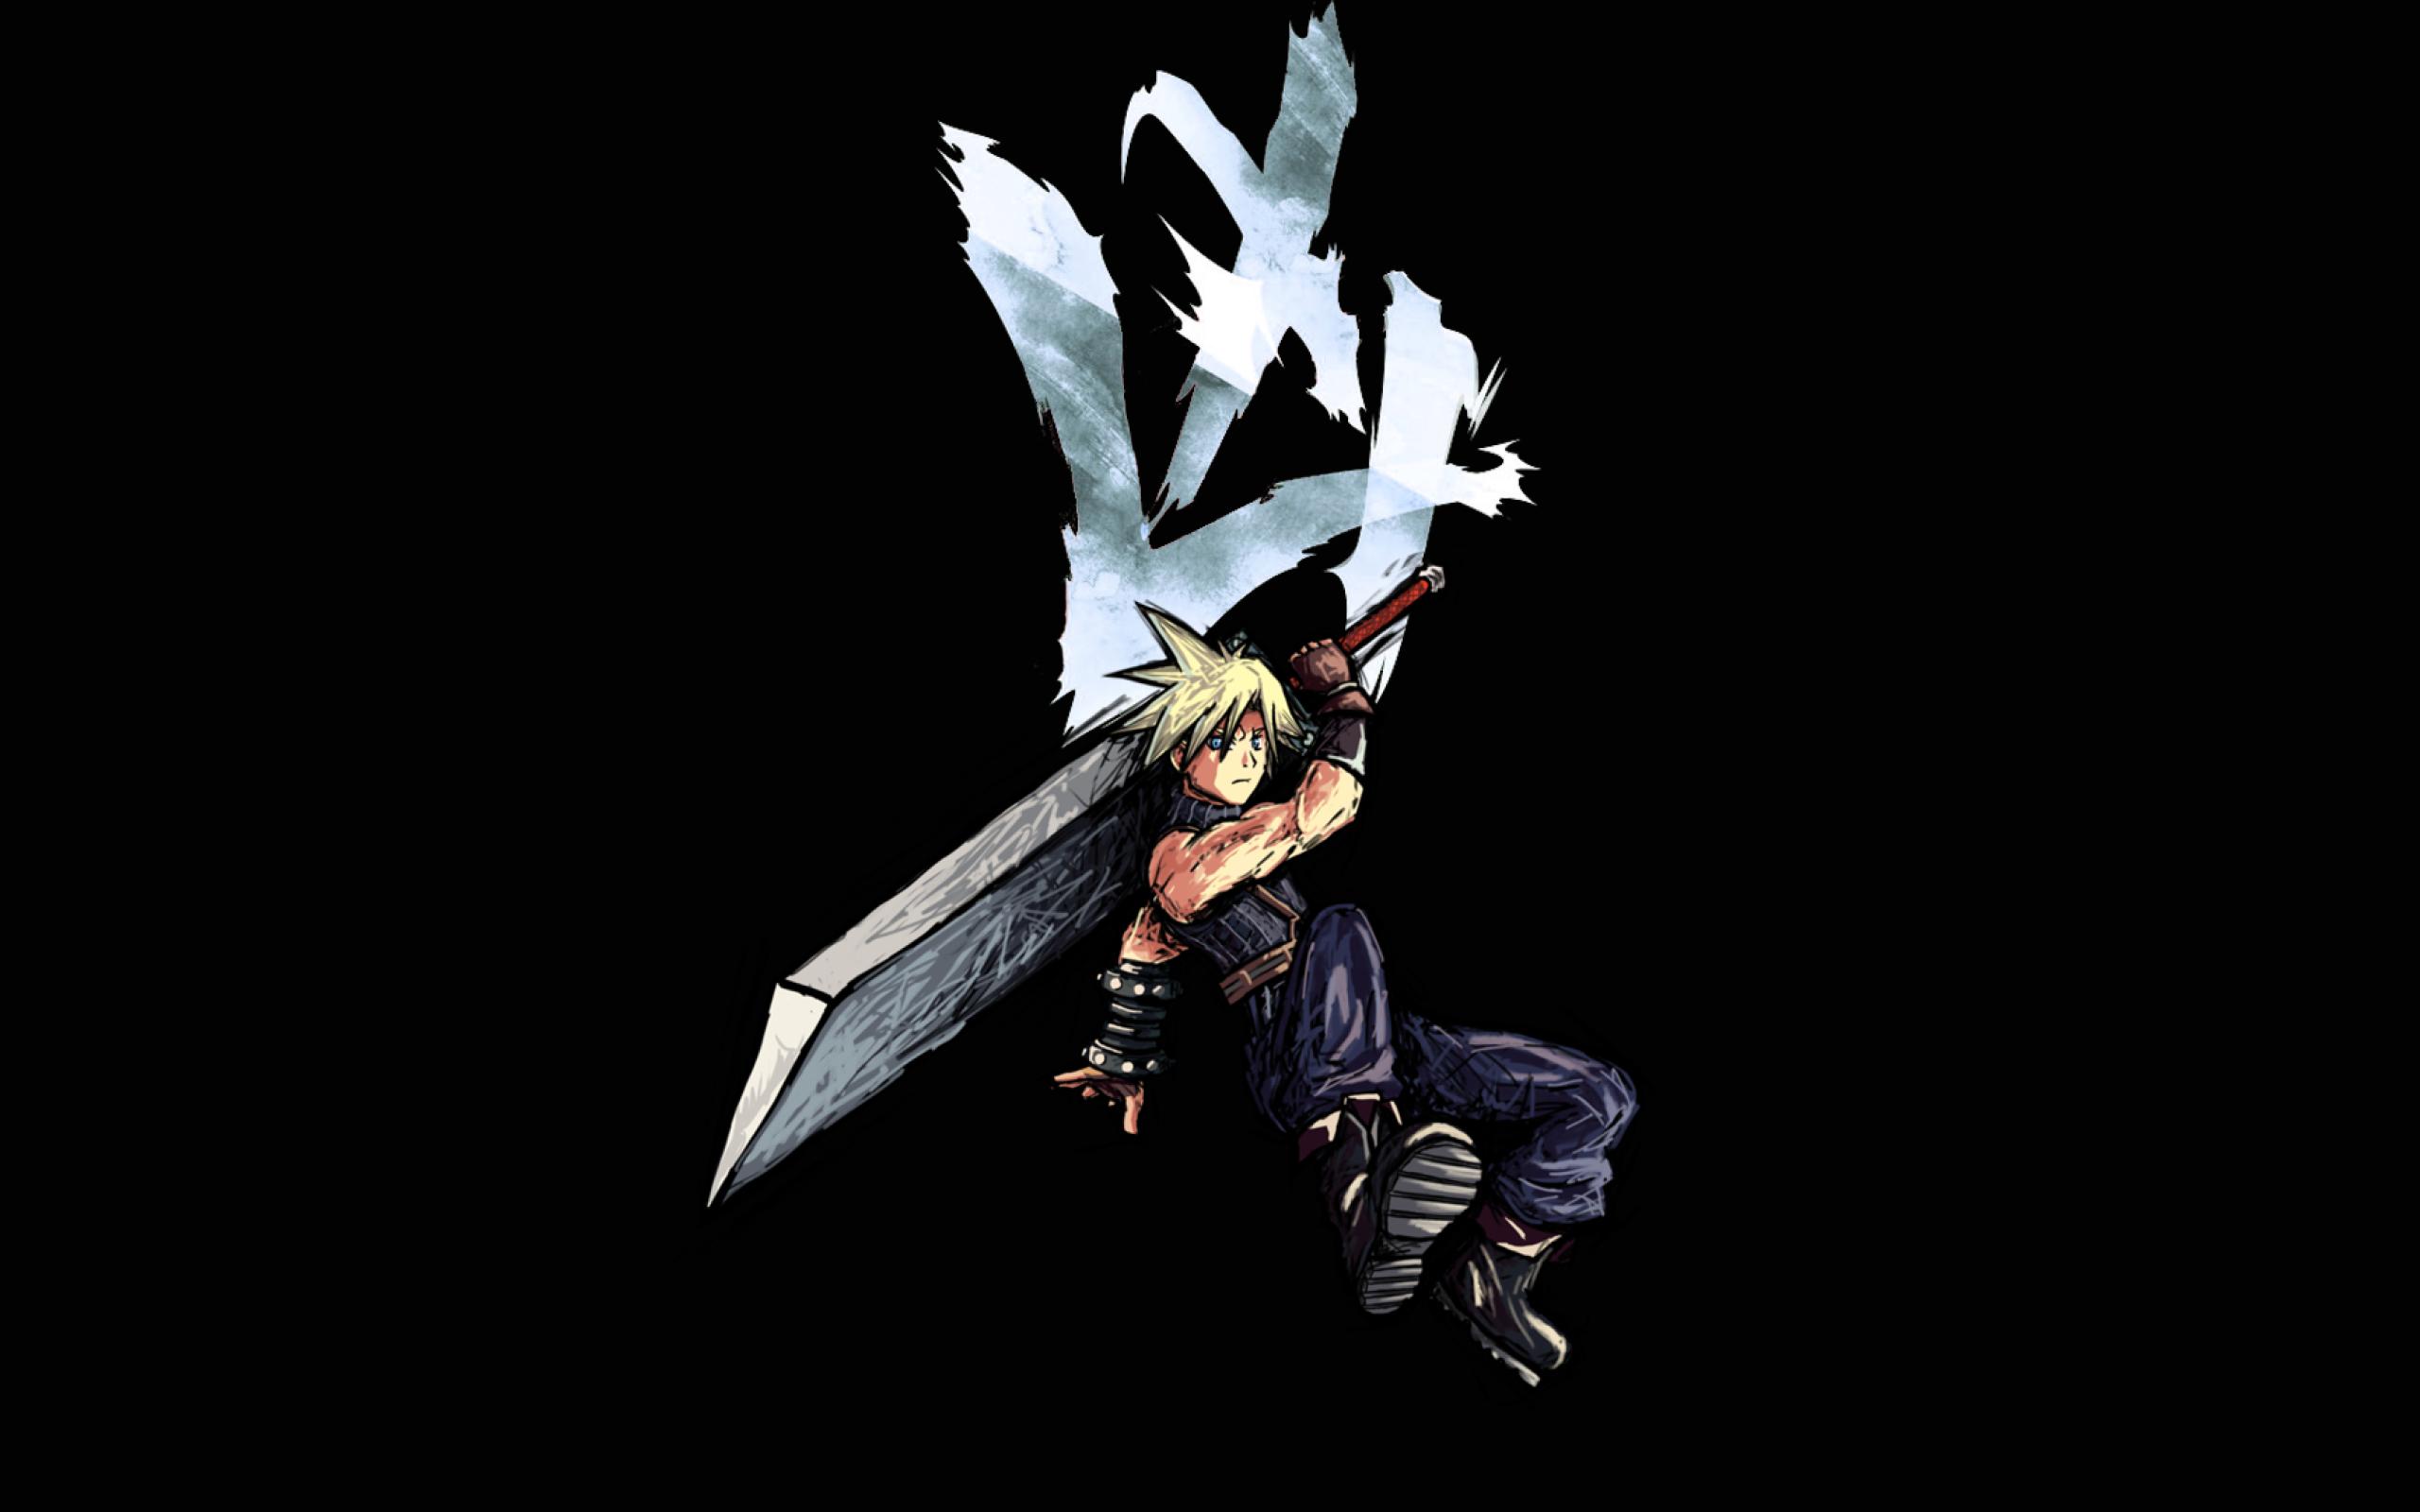 2560x1600 Cloud Strife Final Fantasy 2560x1600 Resolution